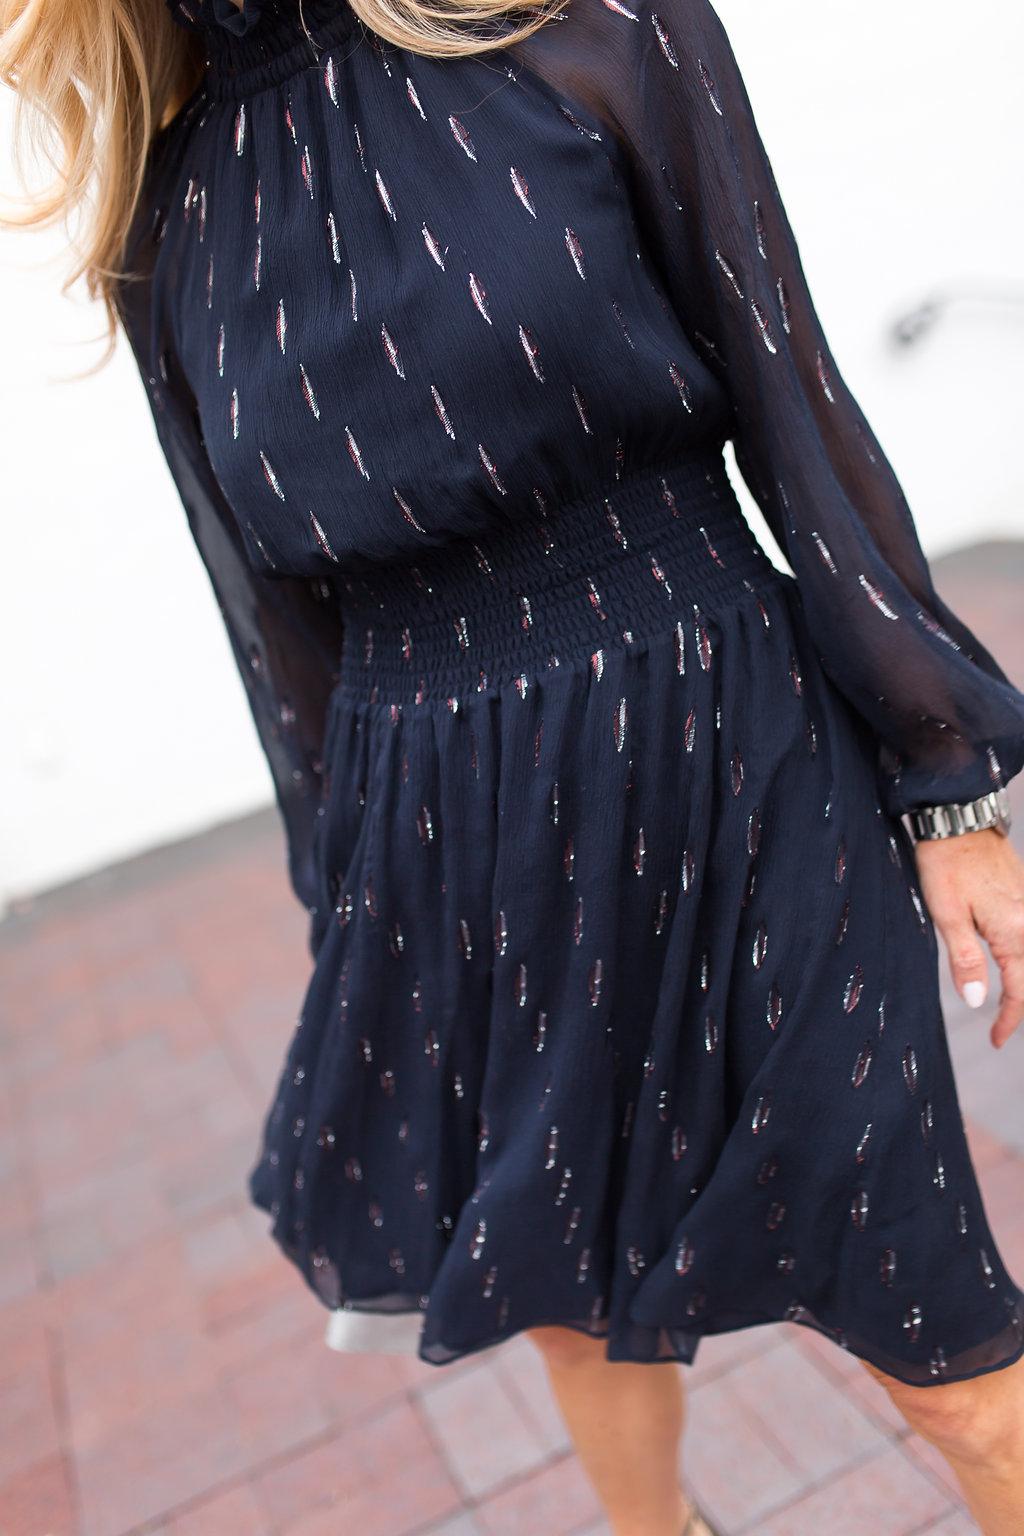 Rebecca Taylor chiffon dress, President's Day Weekend Sales